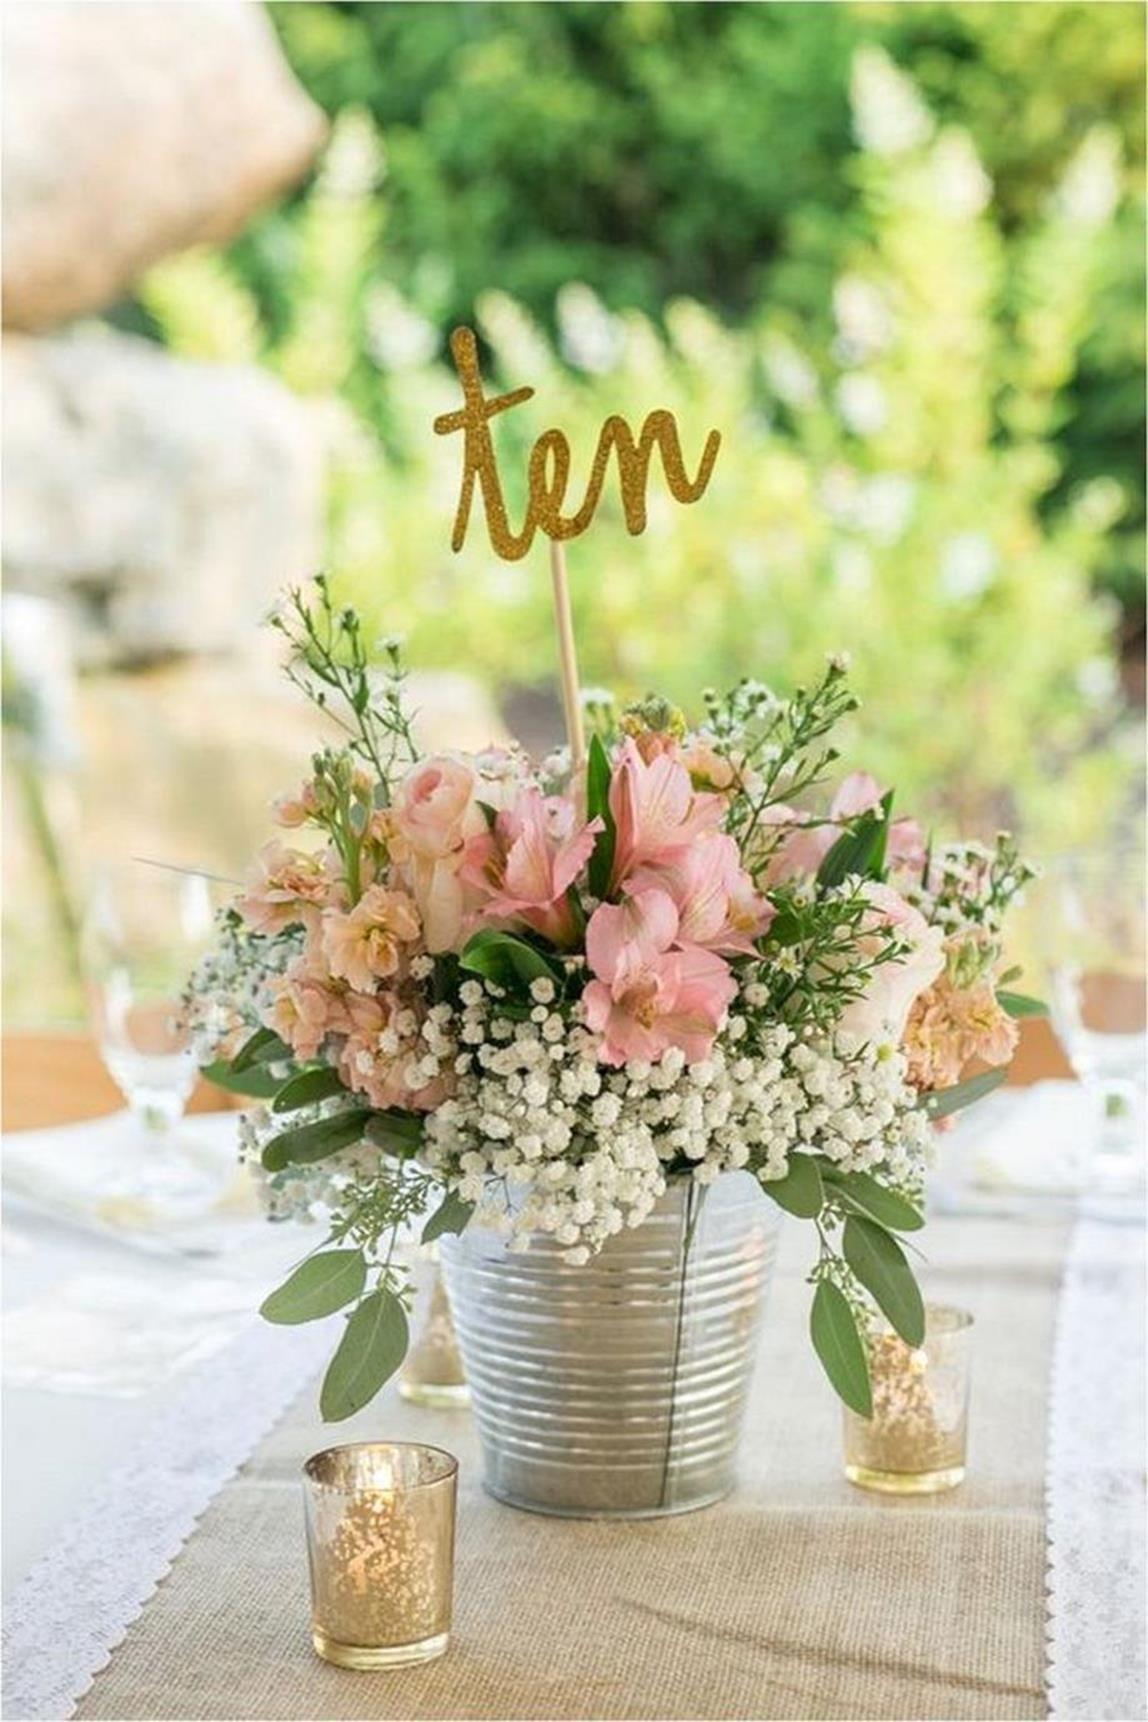 Inexpensive Wedding Centerpiece Ideas 2 Weddingflowers Cheap Wedding Centerpieces Rustic Wedding Centerpieces Wedding Table Decorations